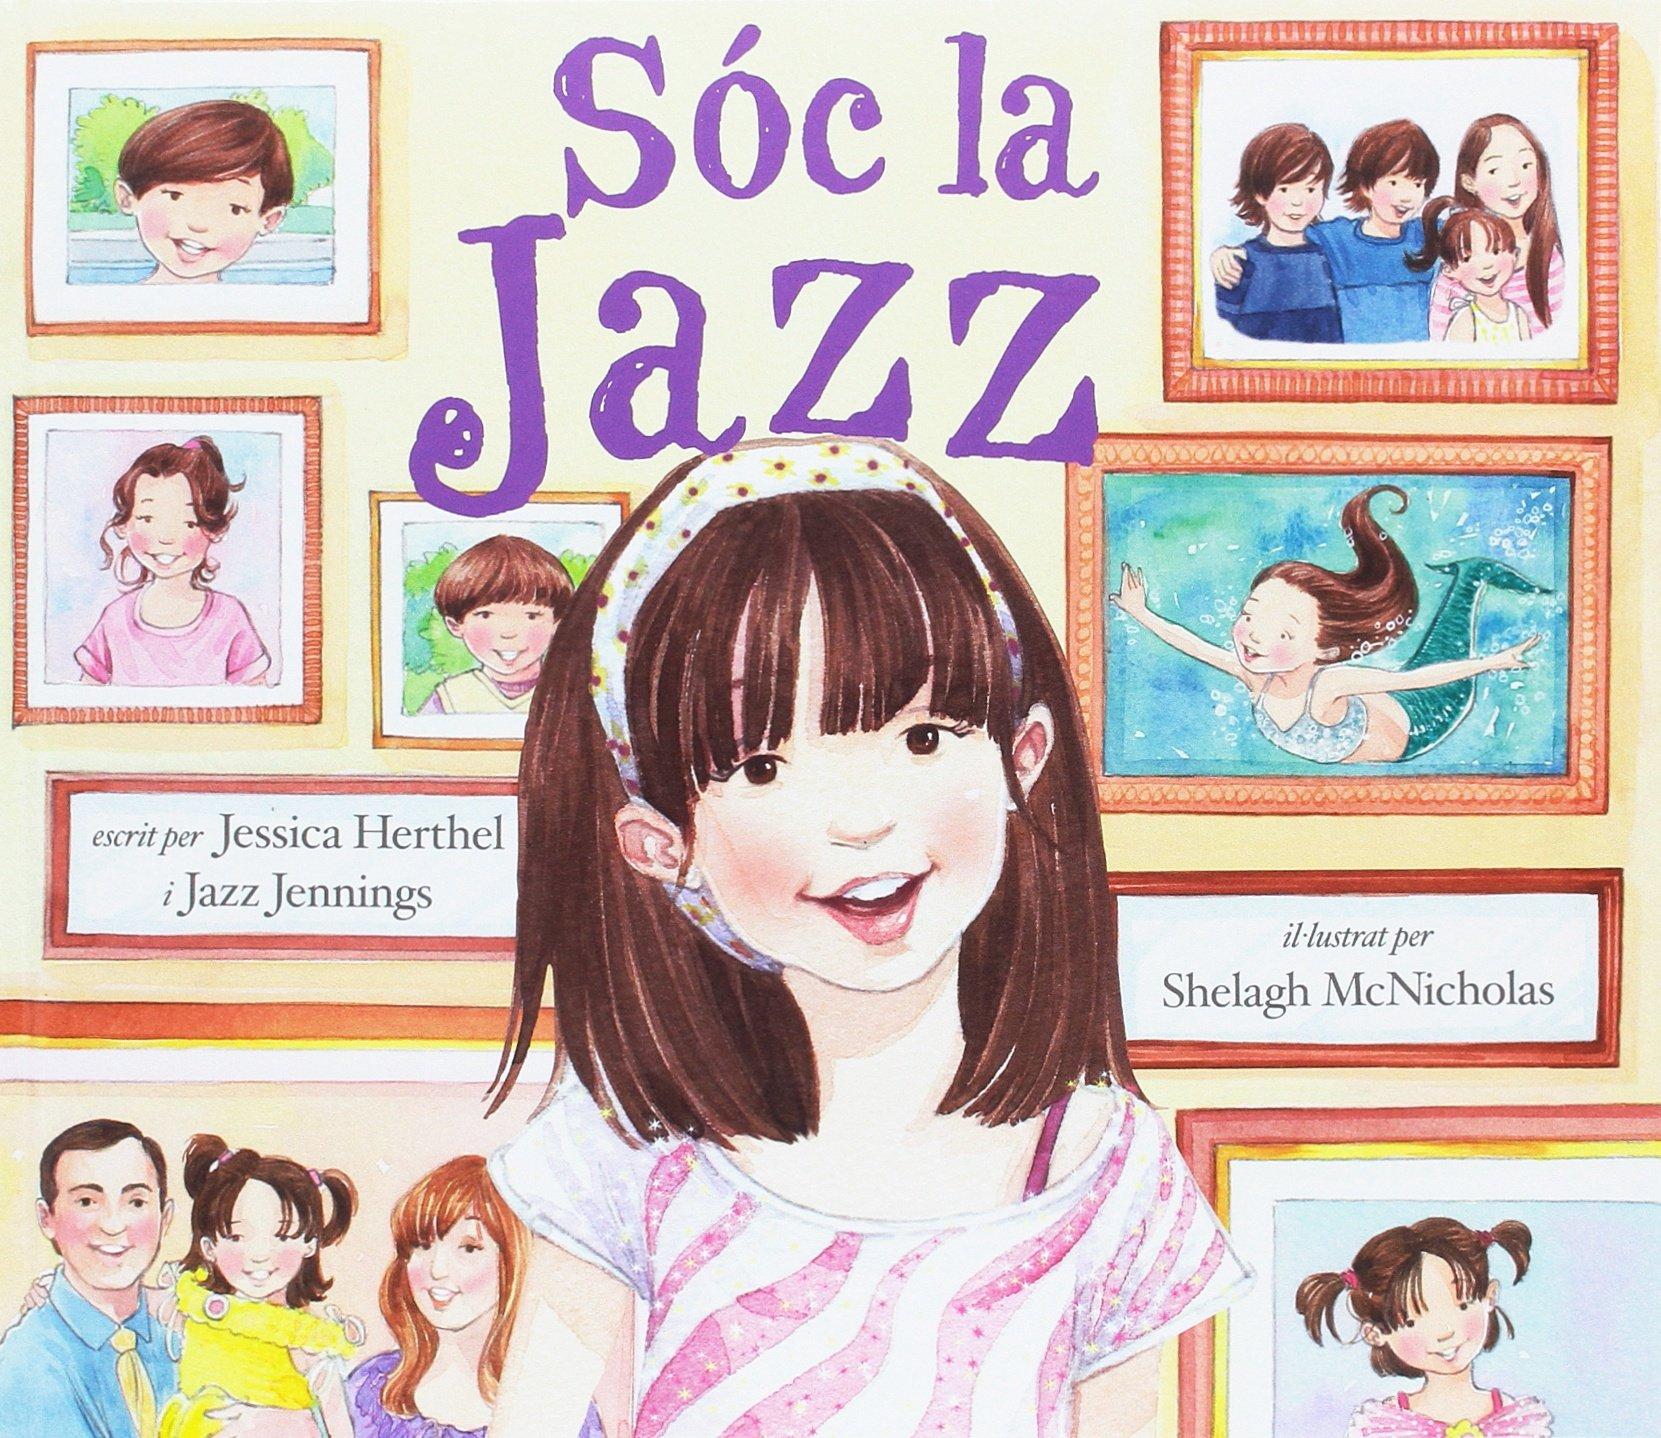 SÓC LA JAZZ: Amazon.es: HERTHEL, JESSICA, JENNINGS, JAZZ, MCNICHOLAS,  SHELAGH, JOLIS, ANNA: Libros